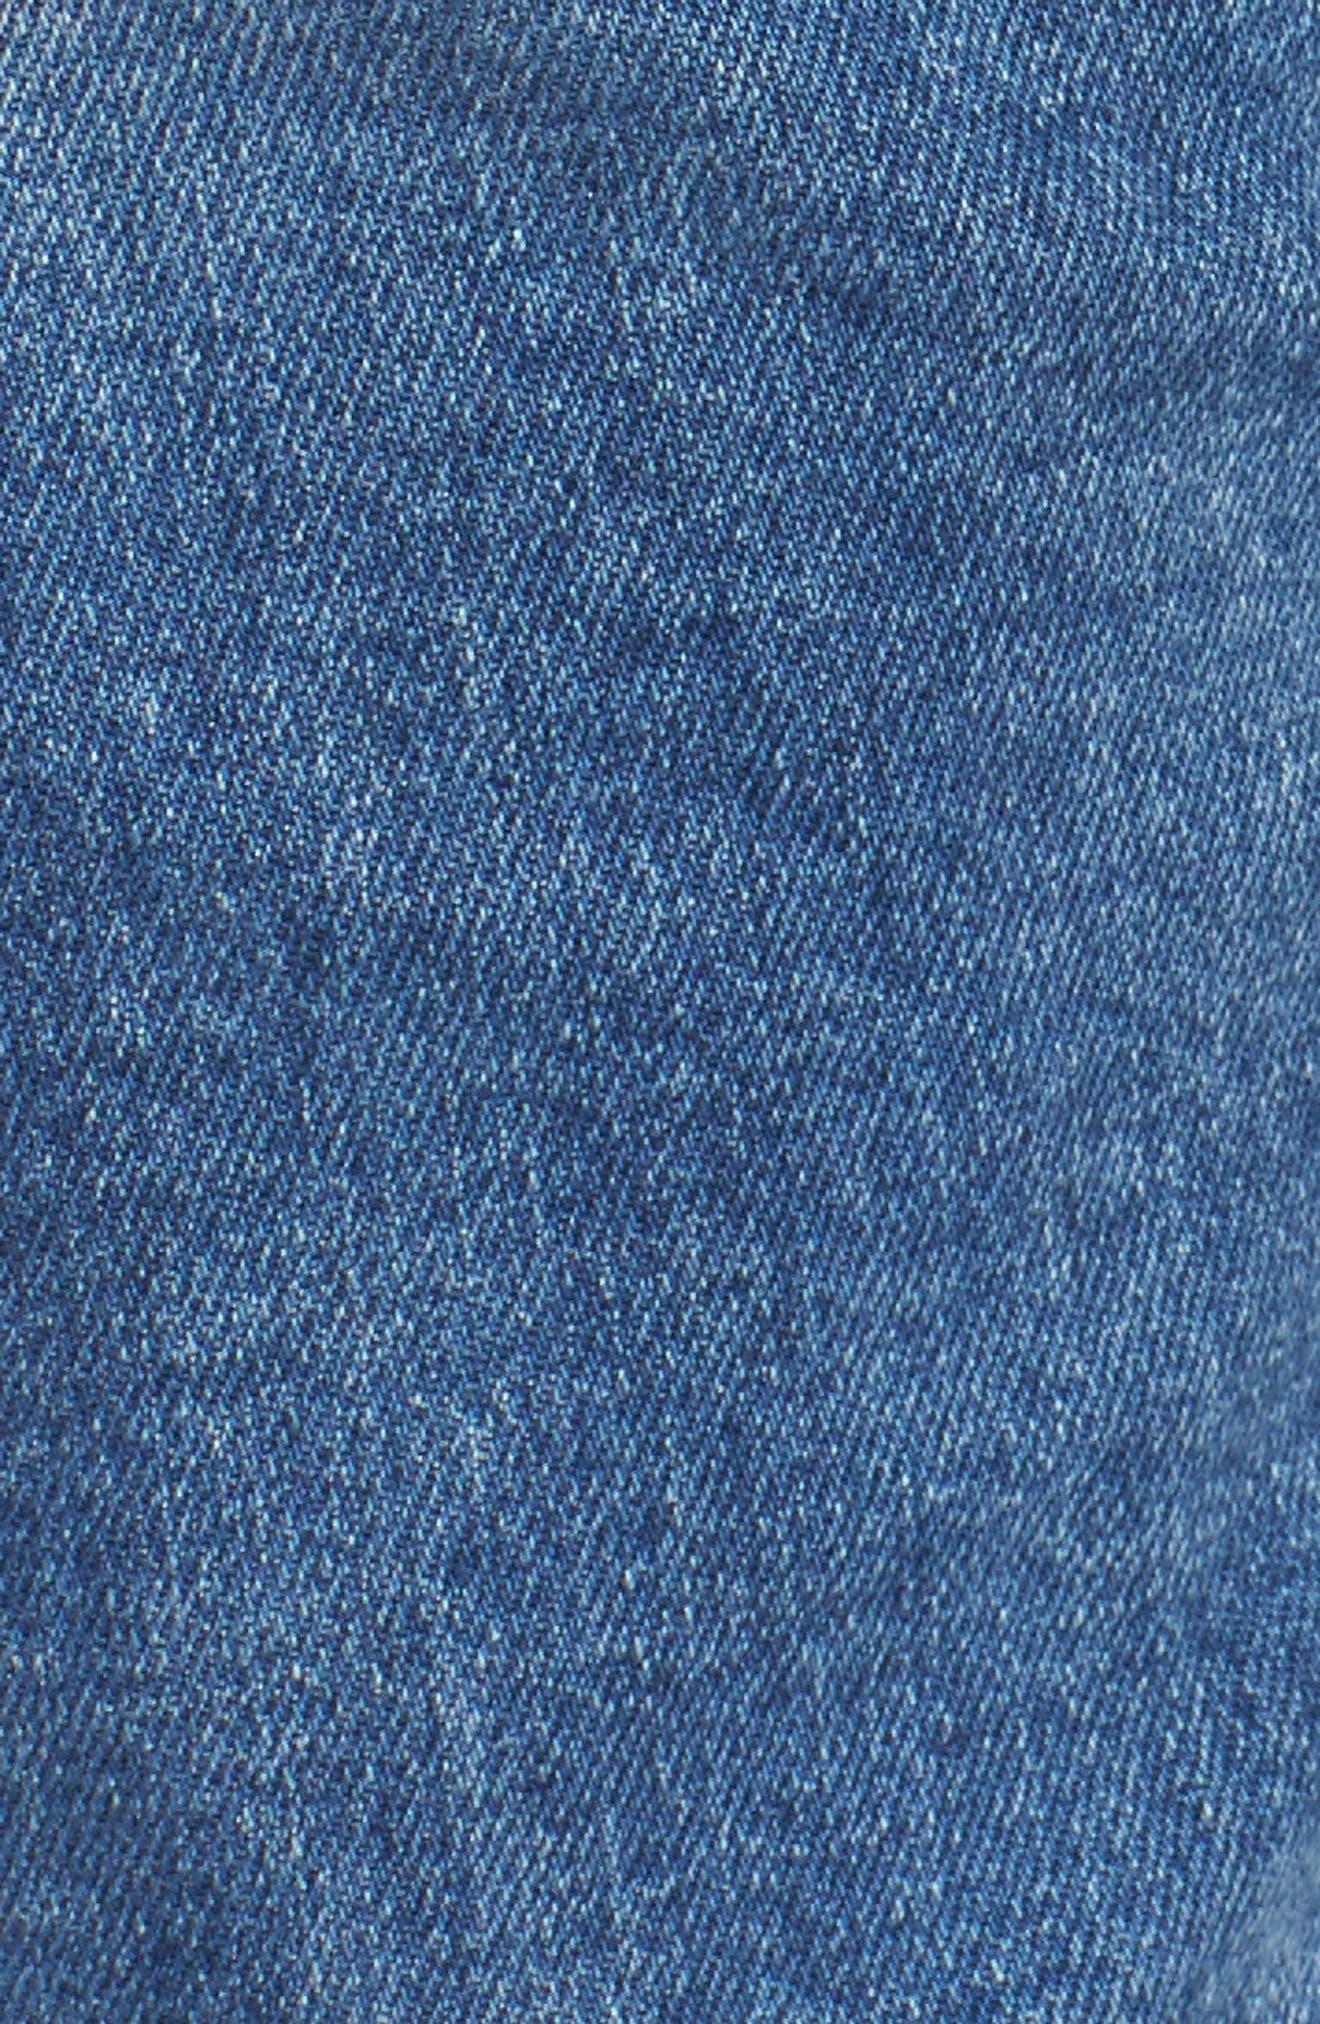 x Gigi Hadid Speed Distressed Ankle Zip Jeans,                             Alternate thumbnail 6, color,                             Mid Blue